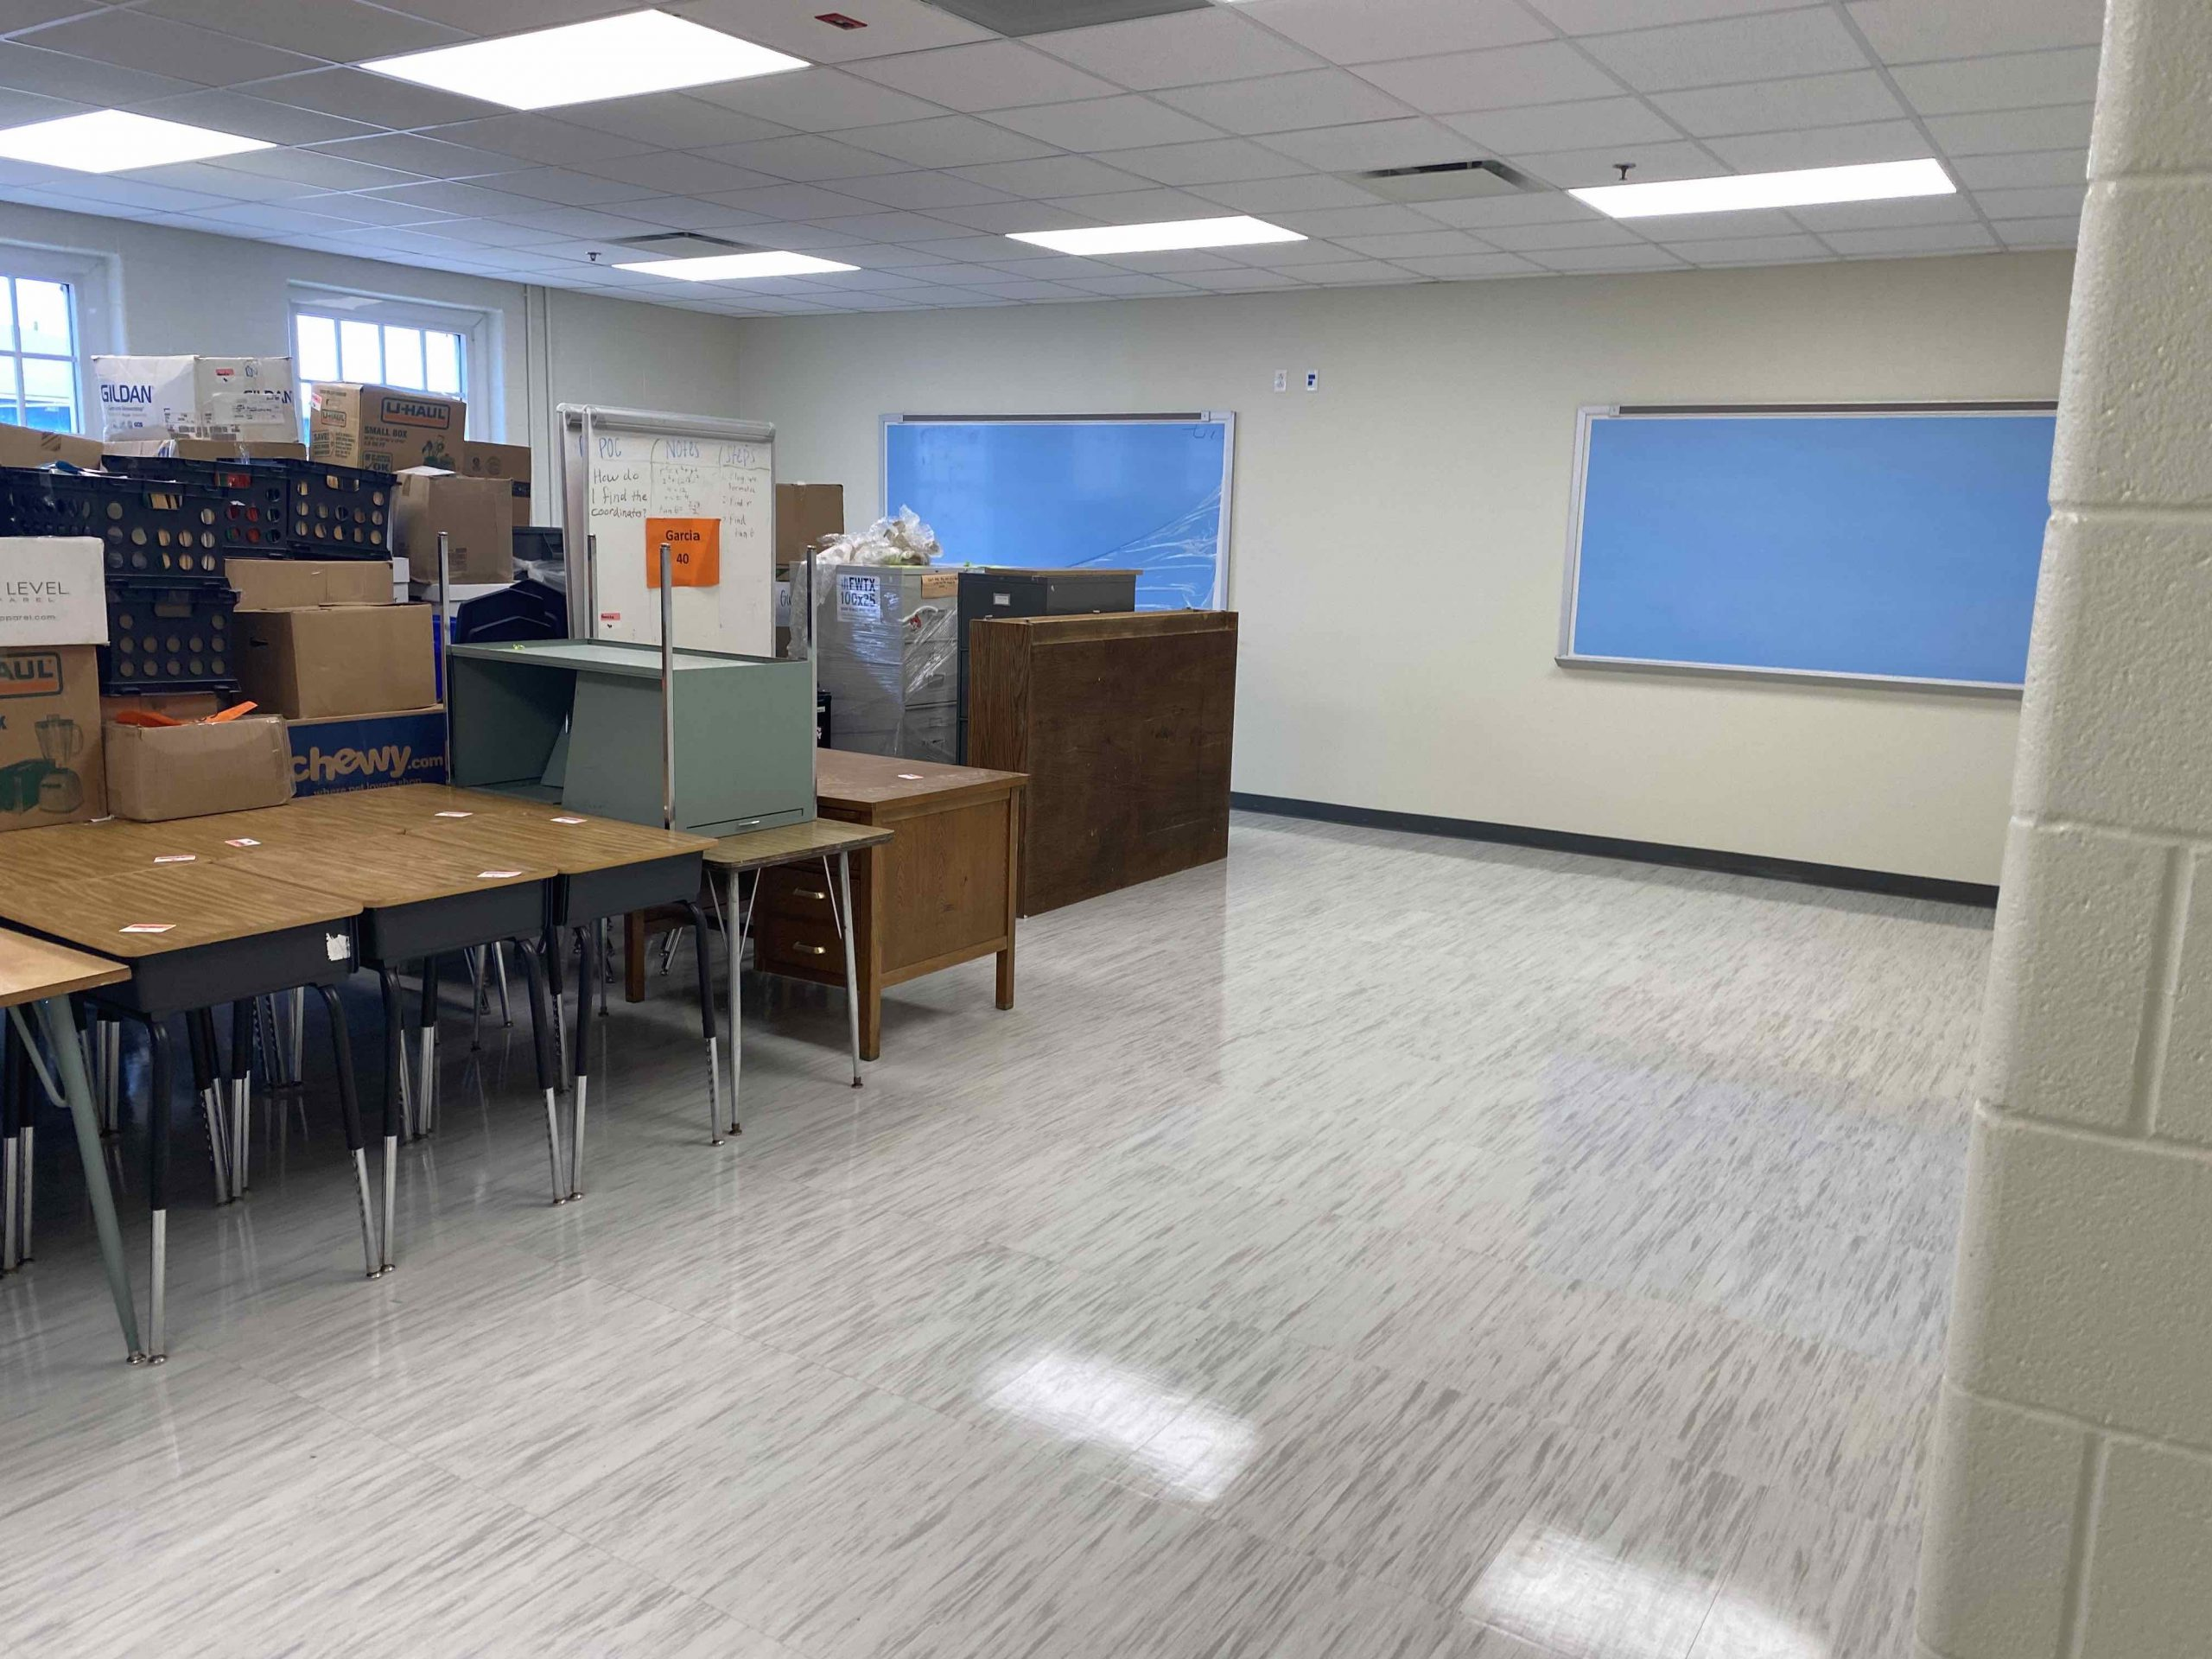 B4 Area Classrooms image 0